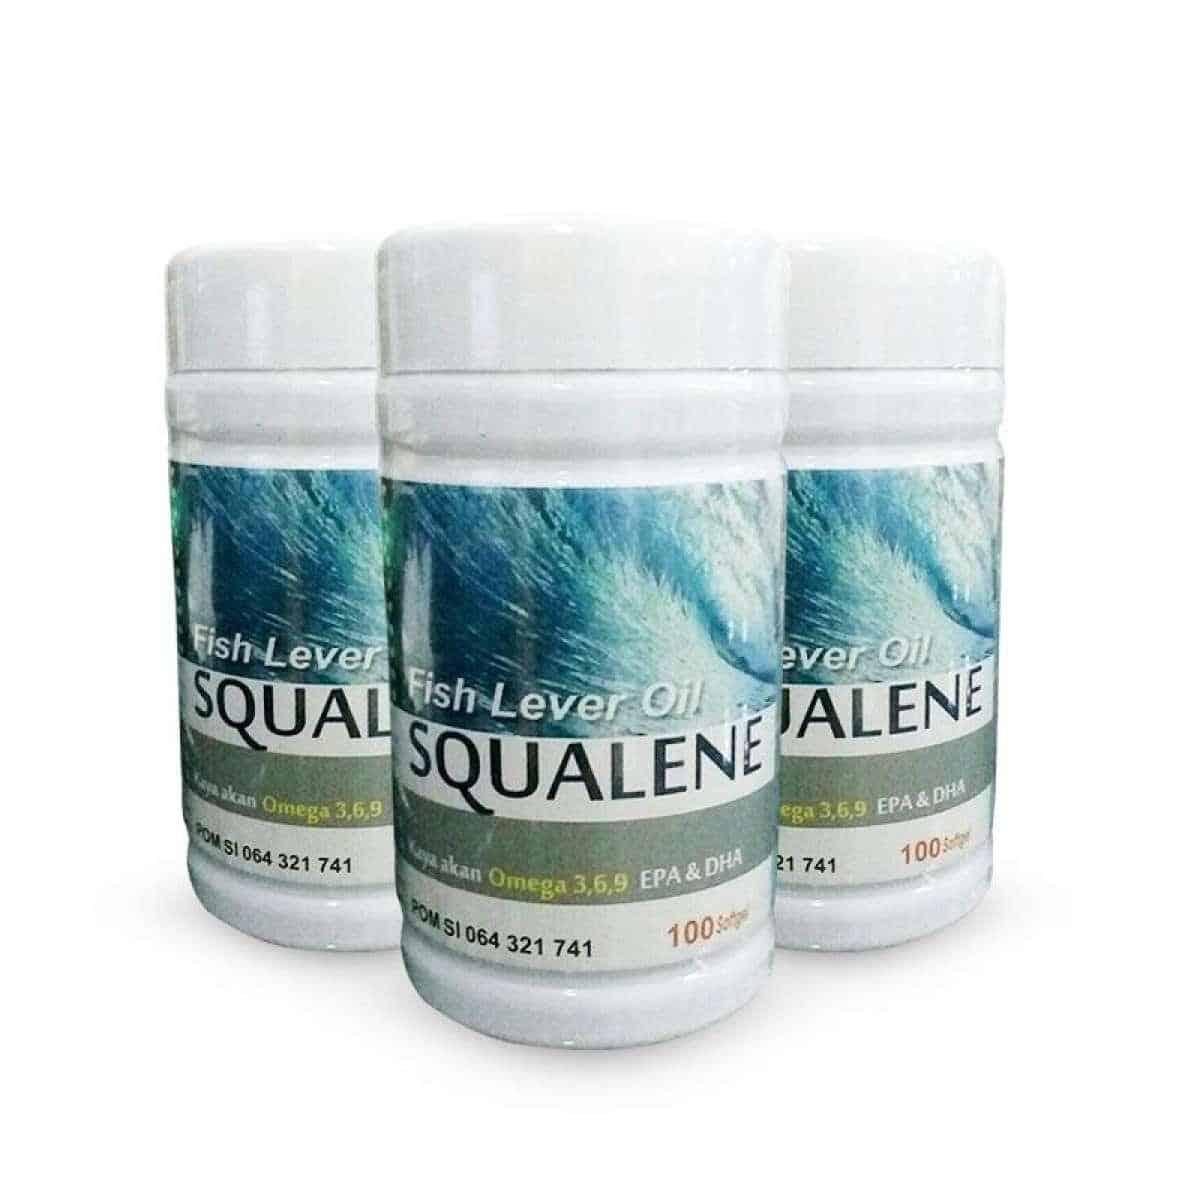 4. Squalene Salmon Fish Liver Oil Omega